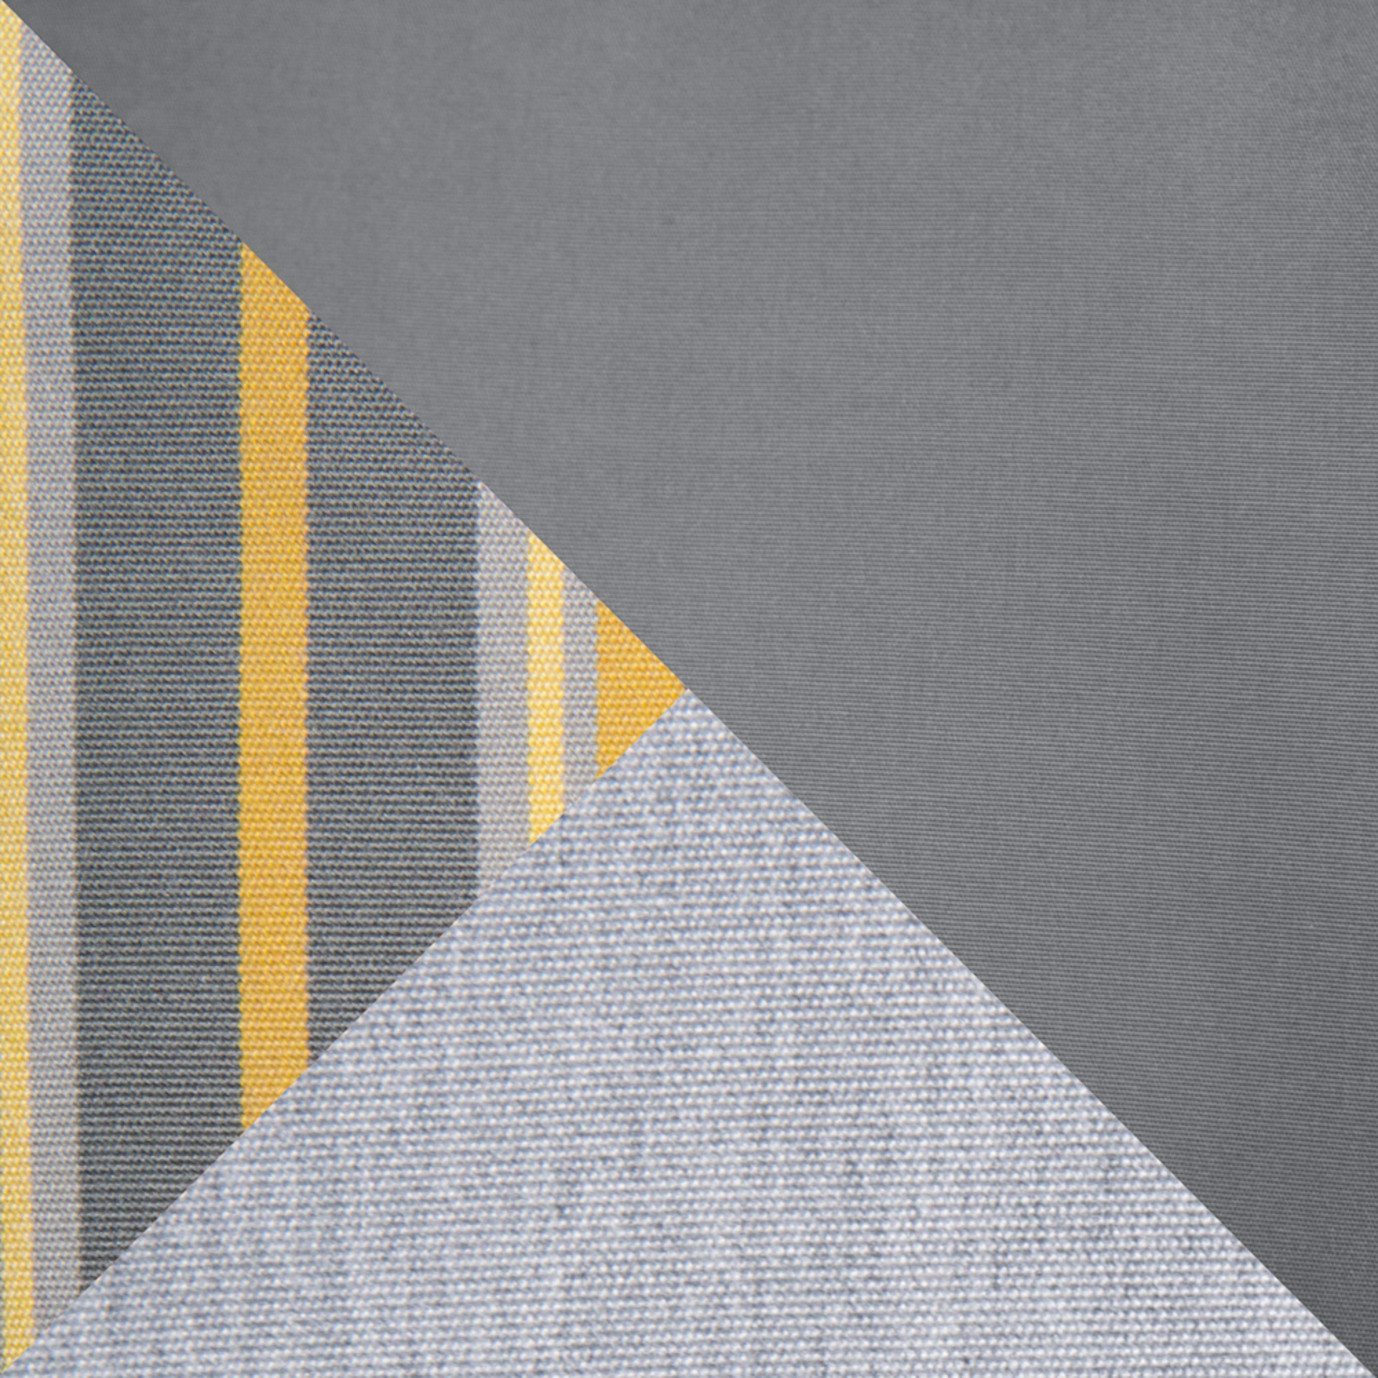 Mili™ 6pc Sofa Sectional - Charcoal Gray